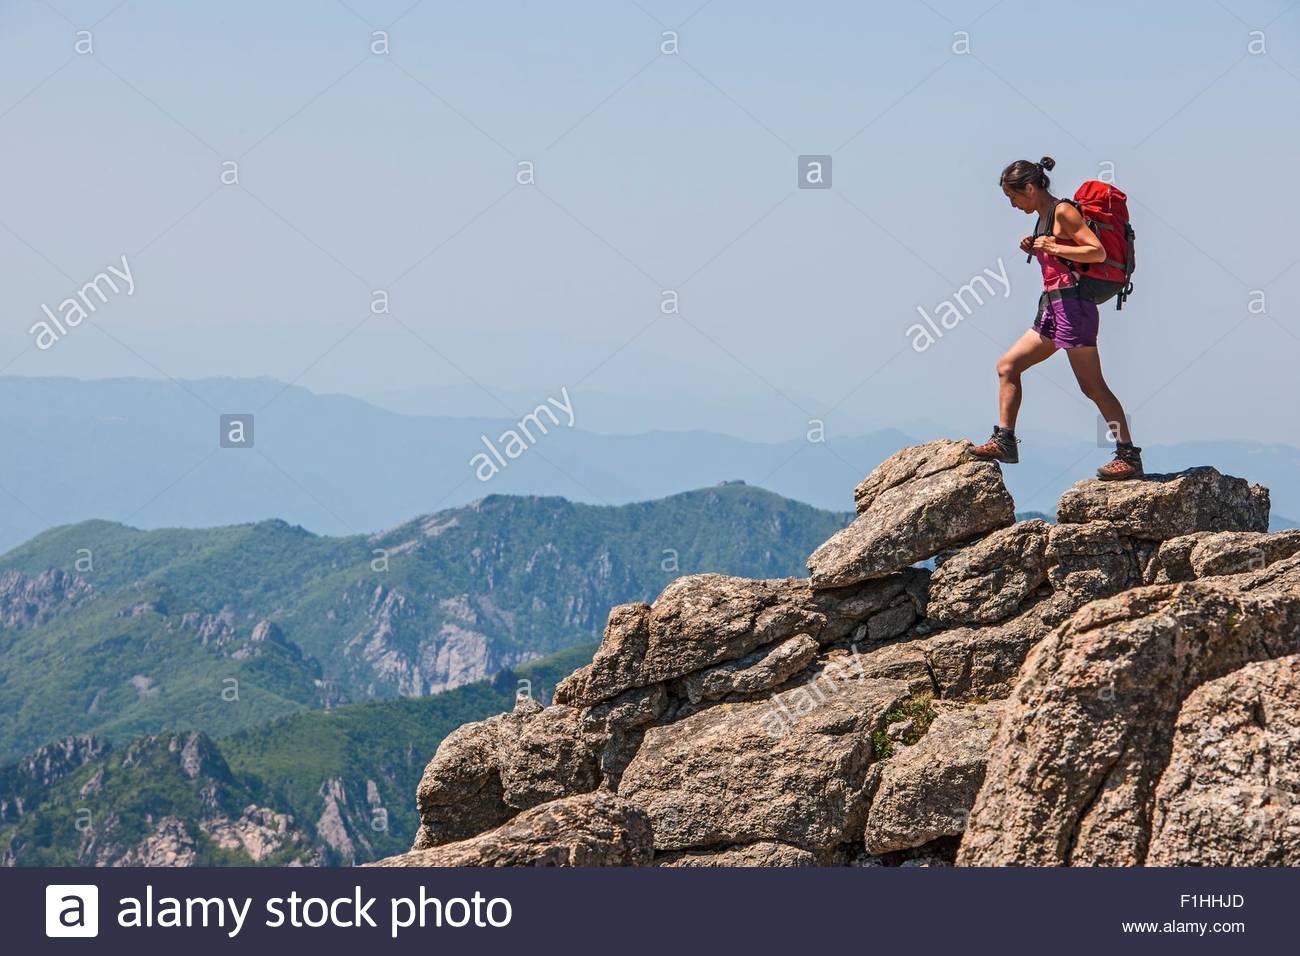 Female hiker stepping on ridge on way to Daecheongbong peak,  Seoraksan National Park in South Korea - Stock Image